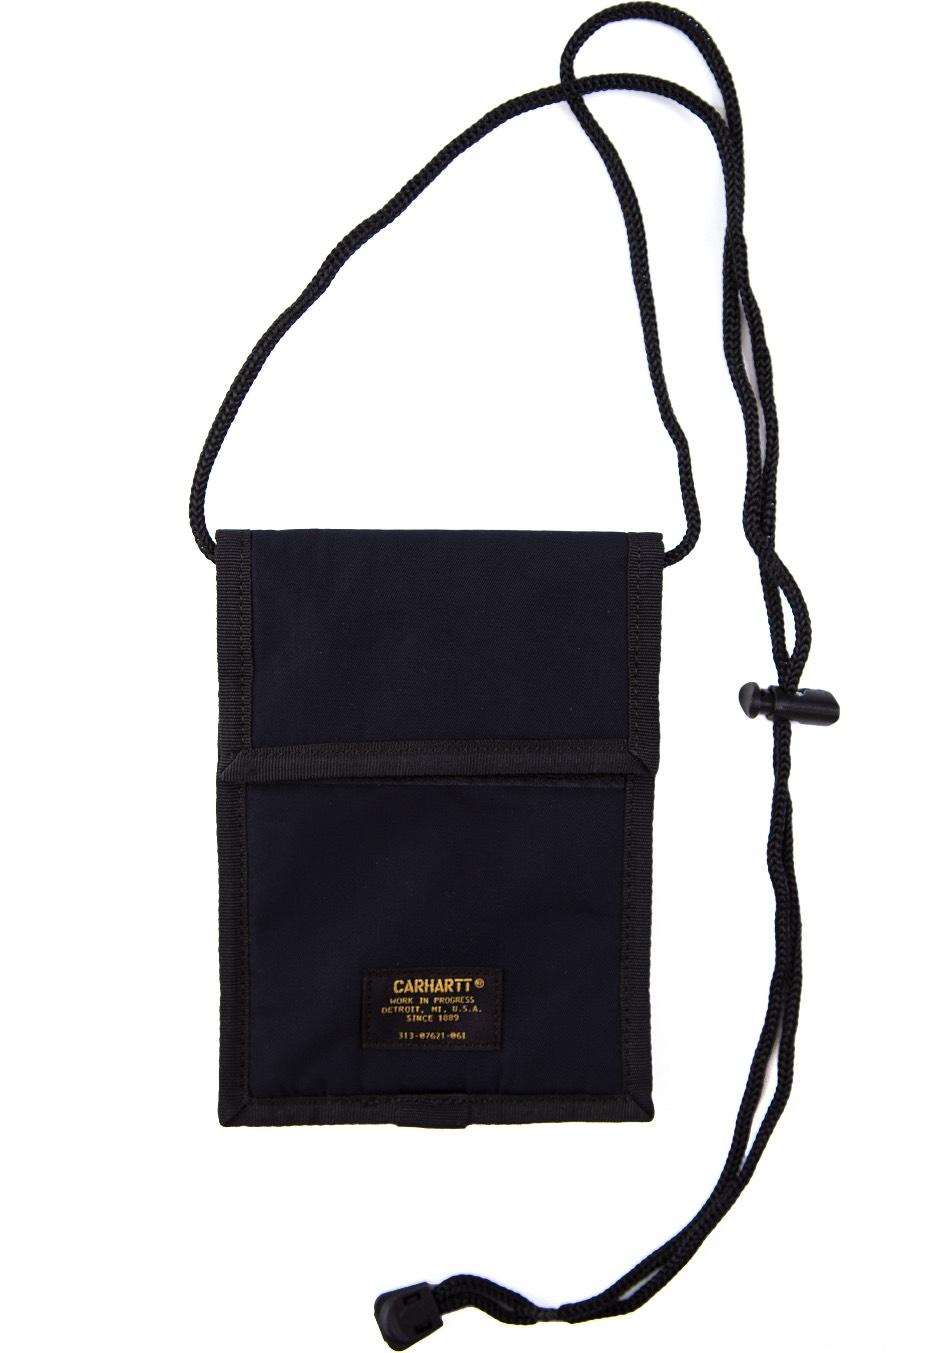 Carhartt Wip Military Dark Navy Neck Pouch Bag